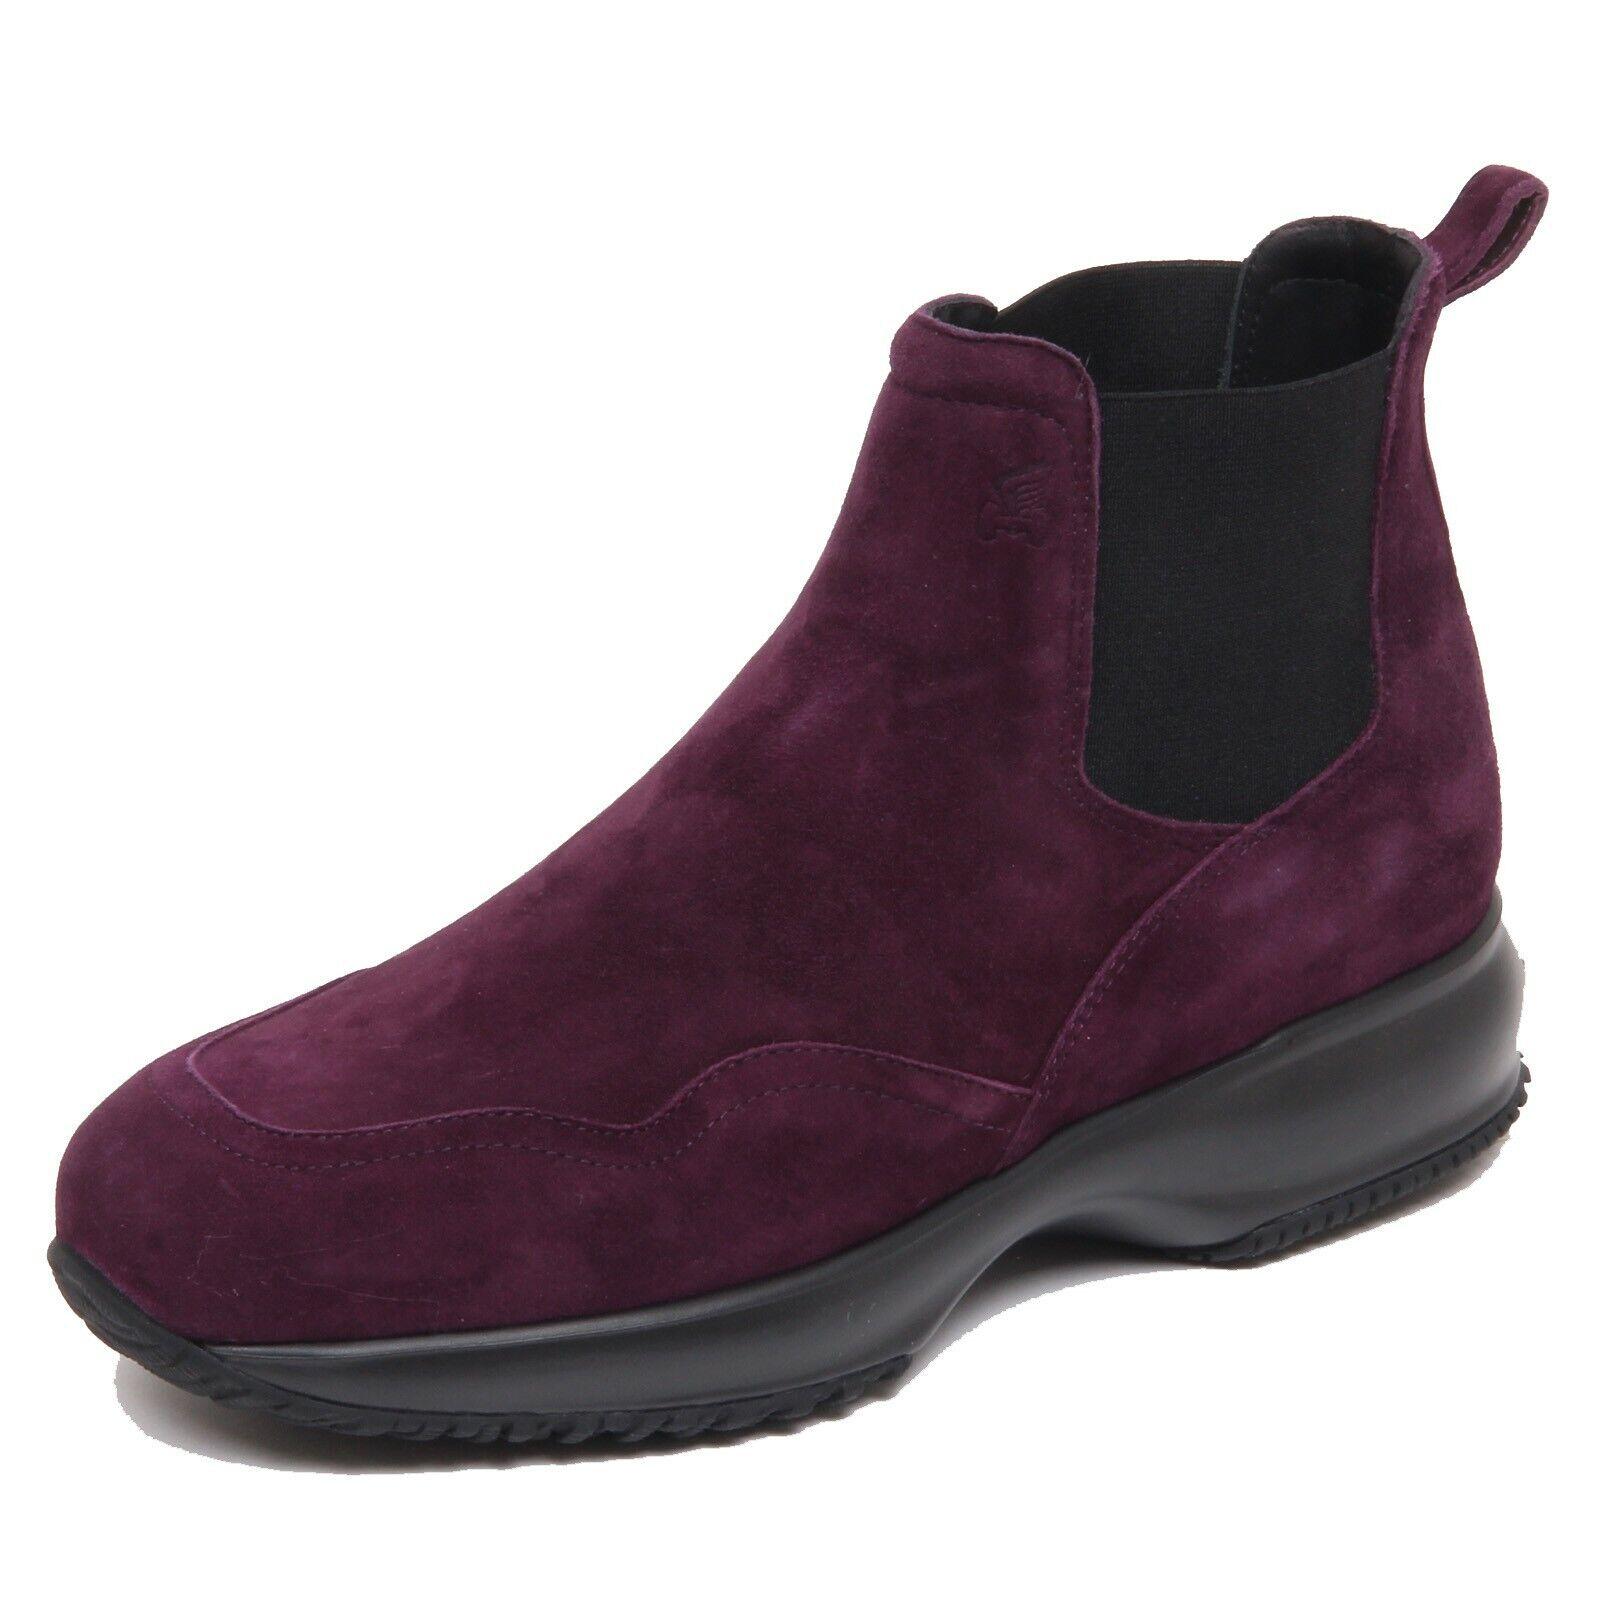 F6344 beatles donna dark purple HOGAN INTERACTIVE CHELSEA boot shoe woman